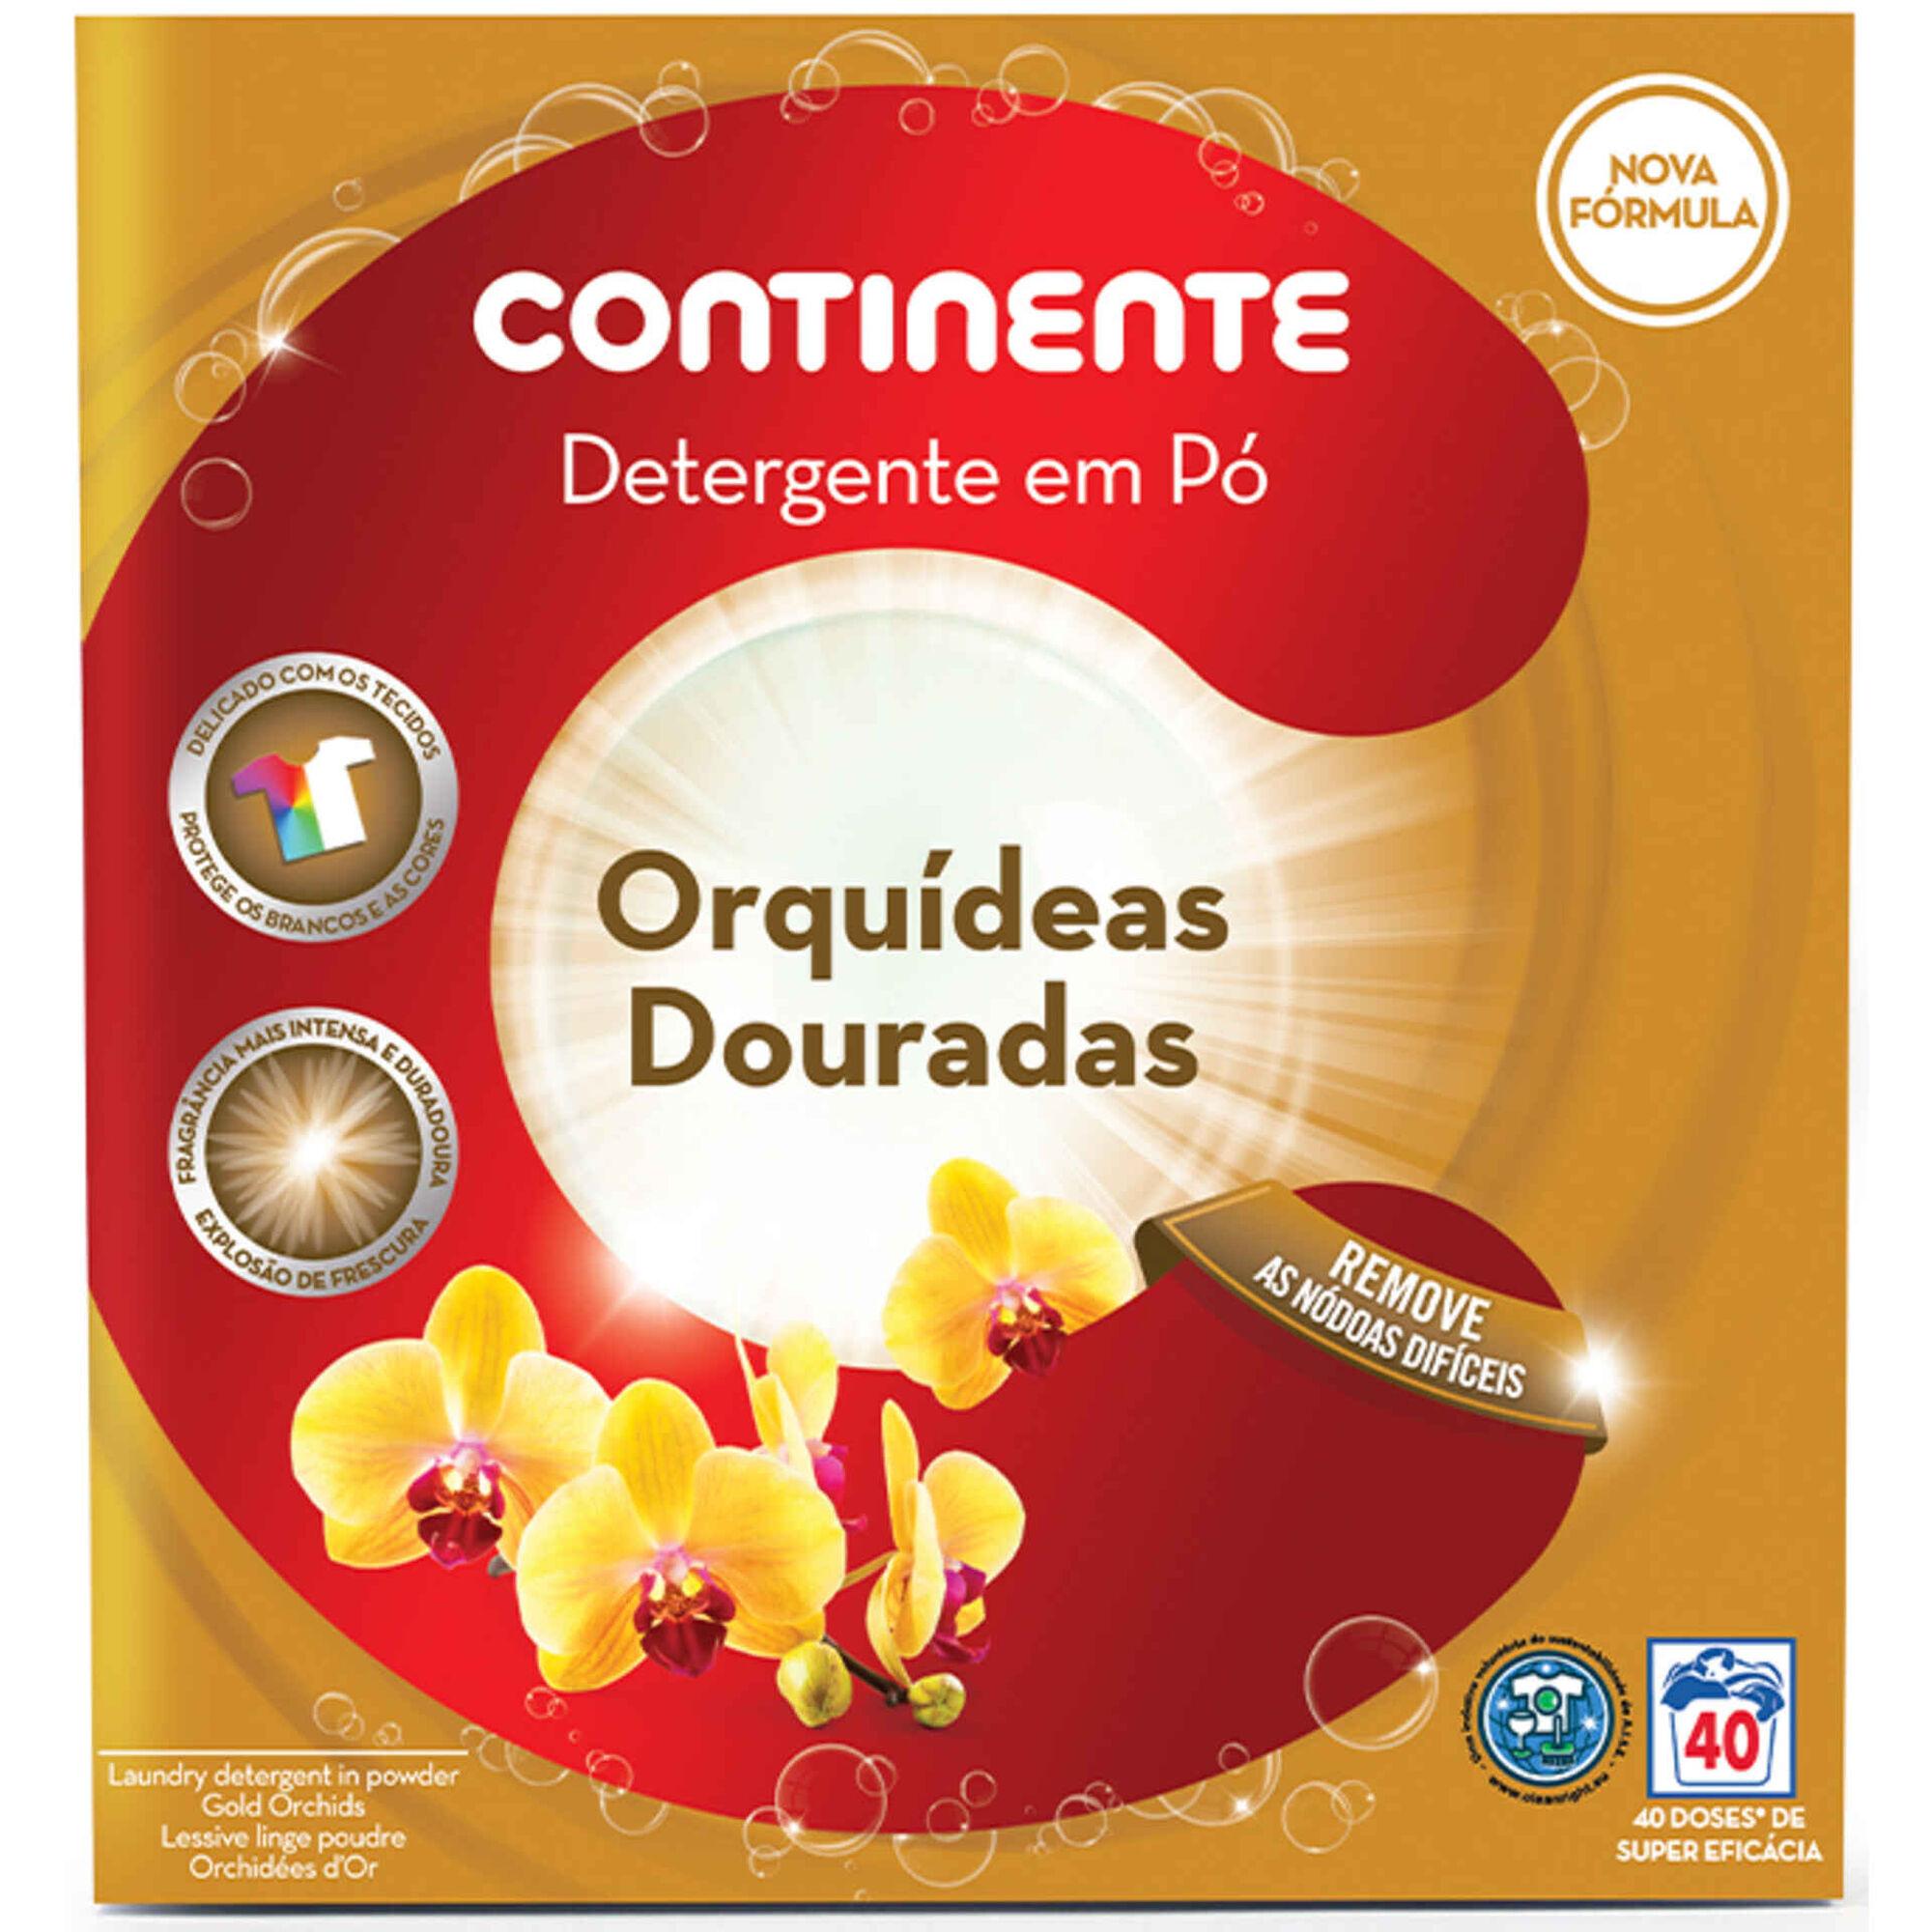 Detergente Máquina Roupa Pó Orquídea Dourada